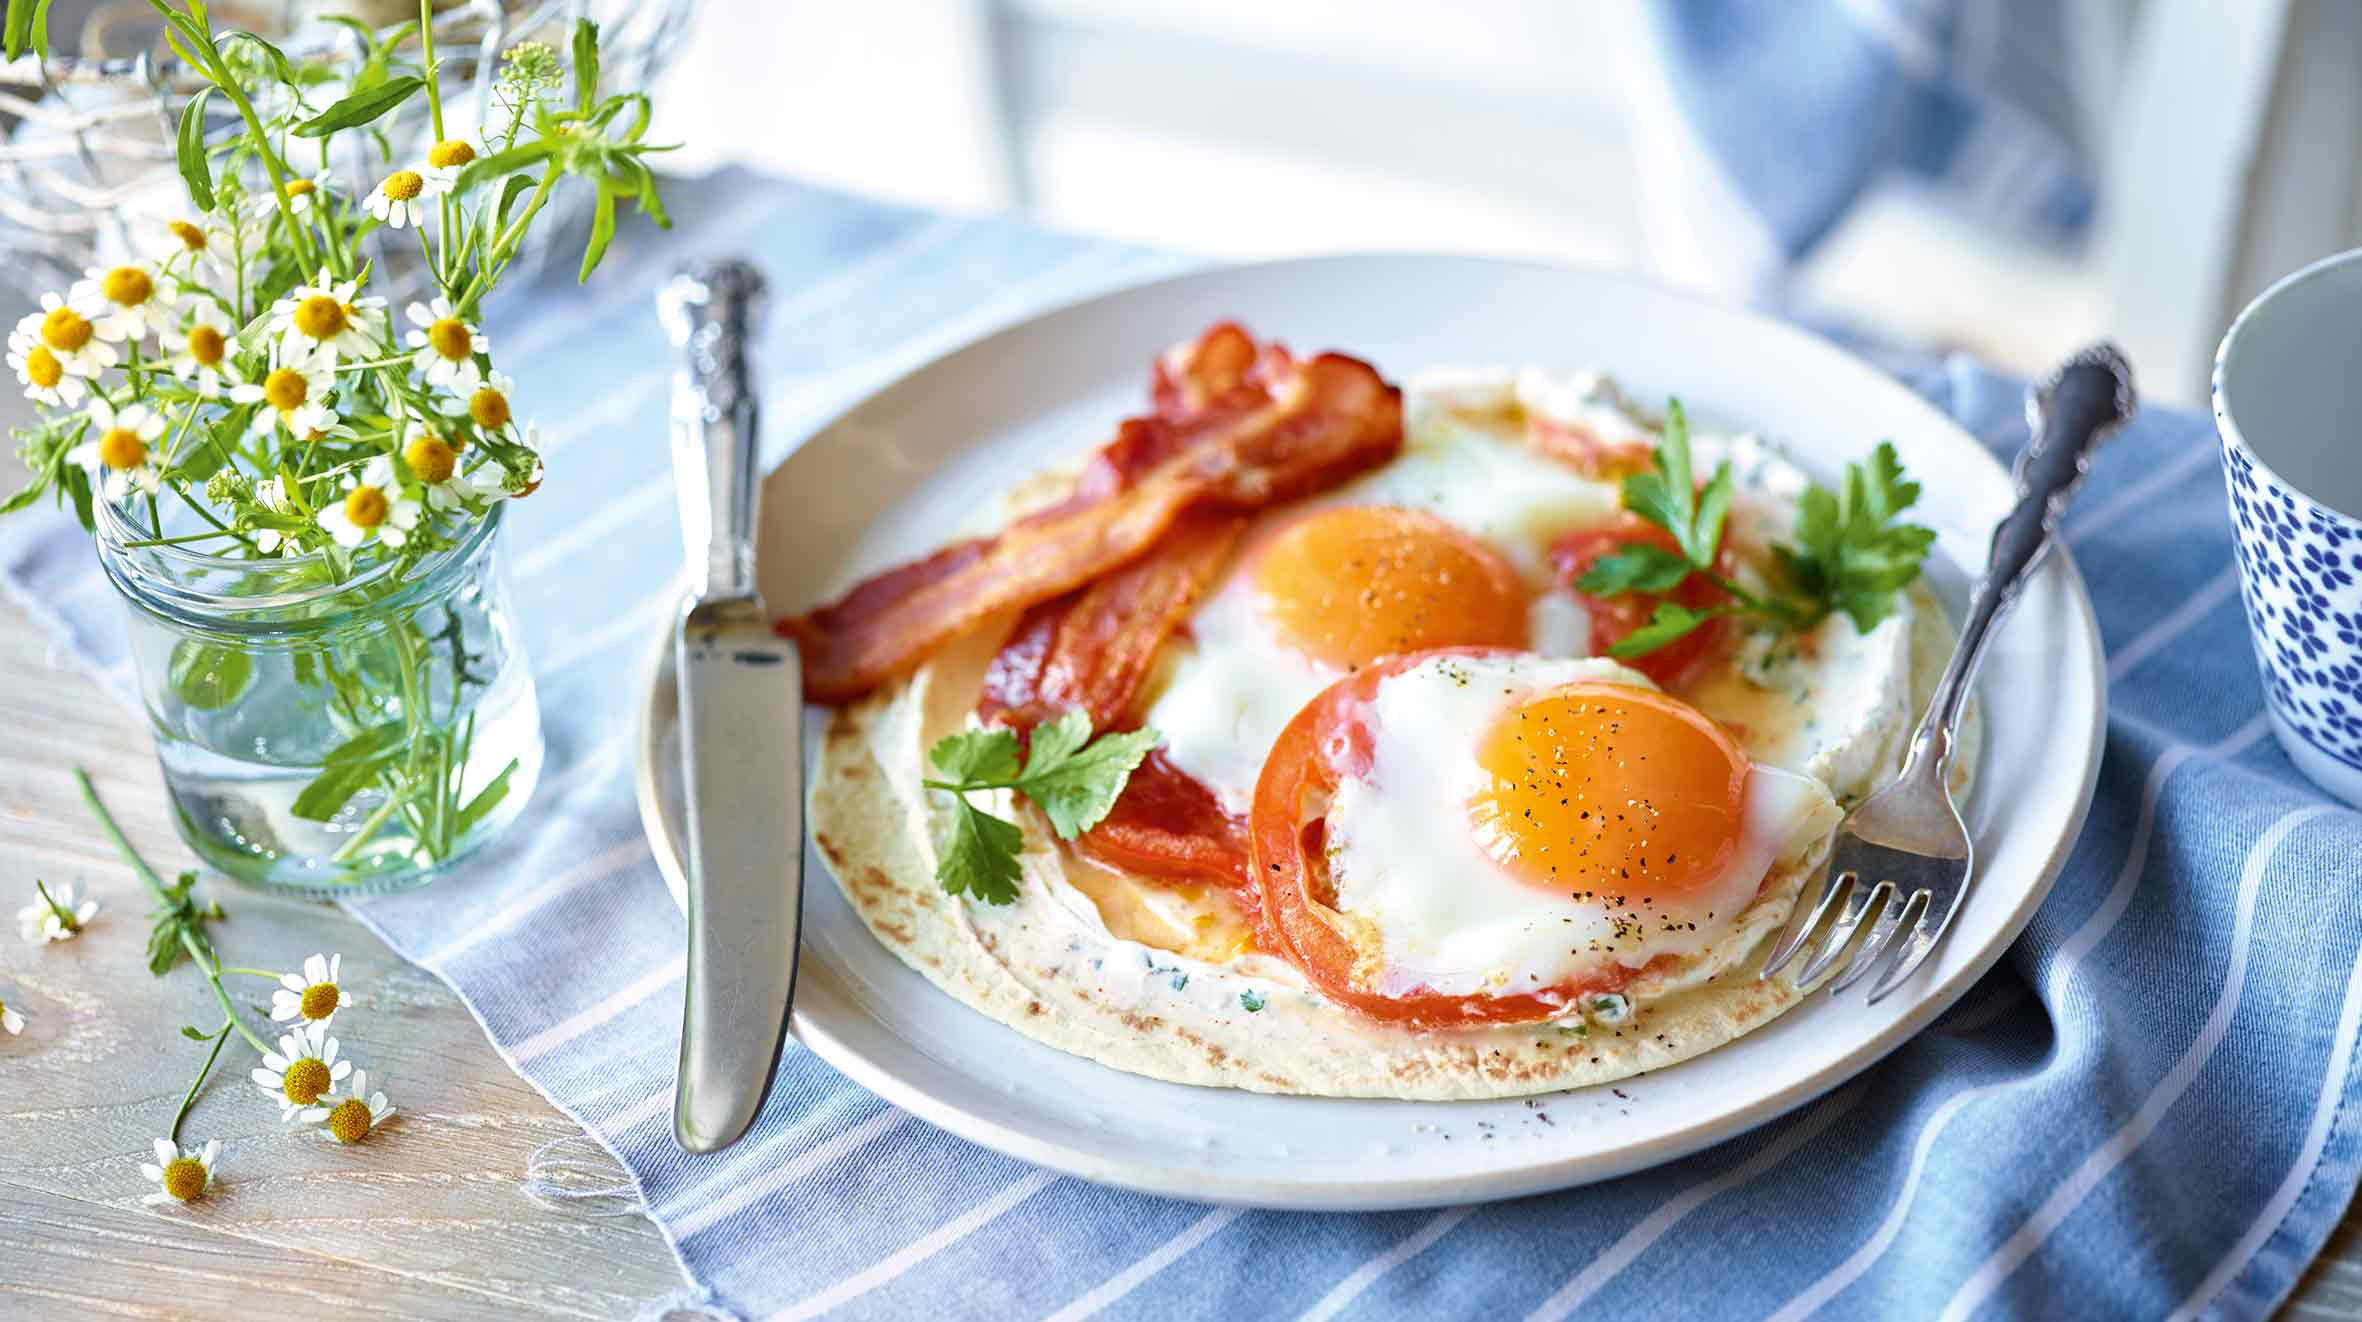 Tortilla z jajkiem i bekonem